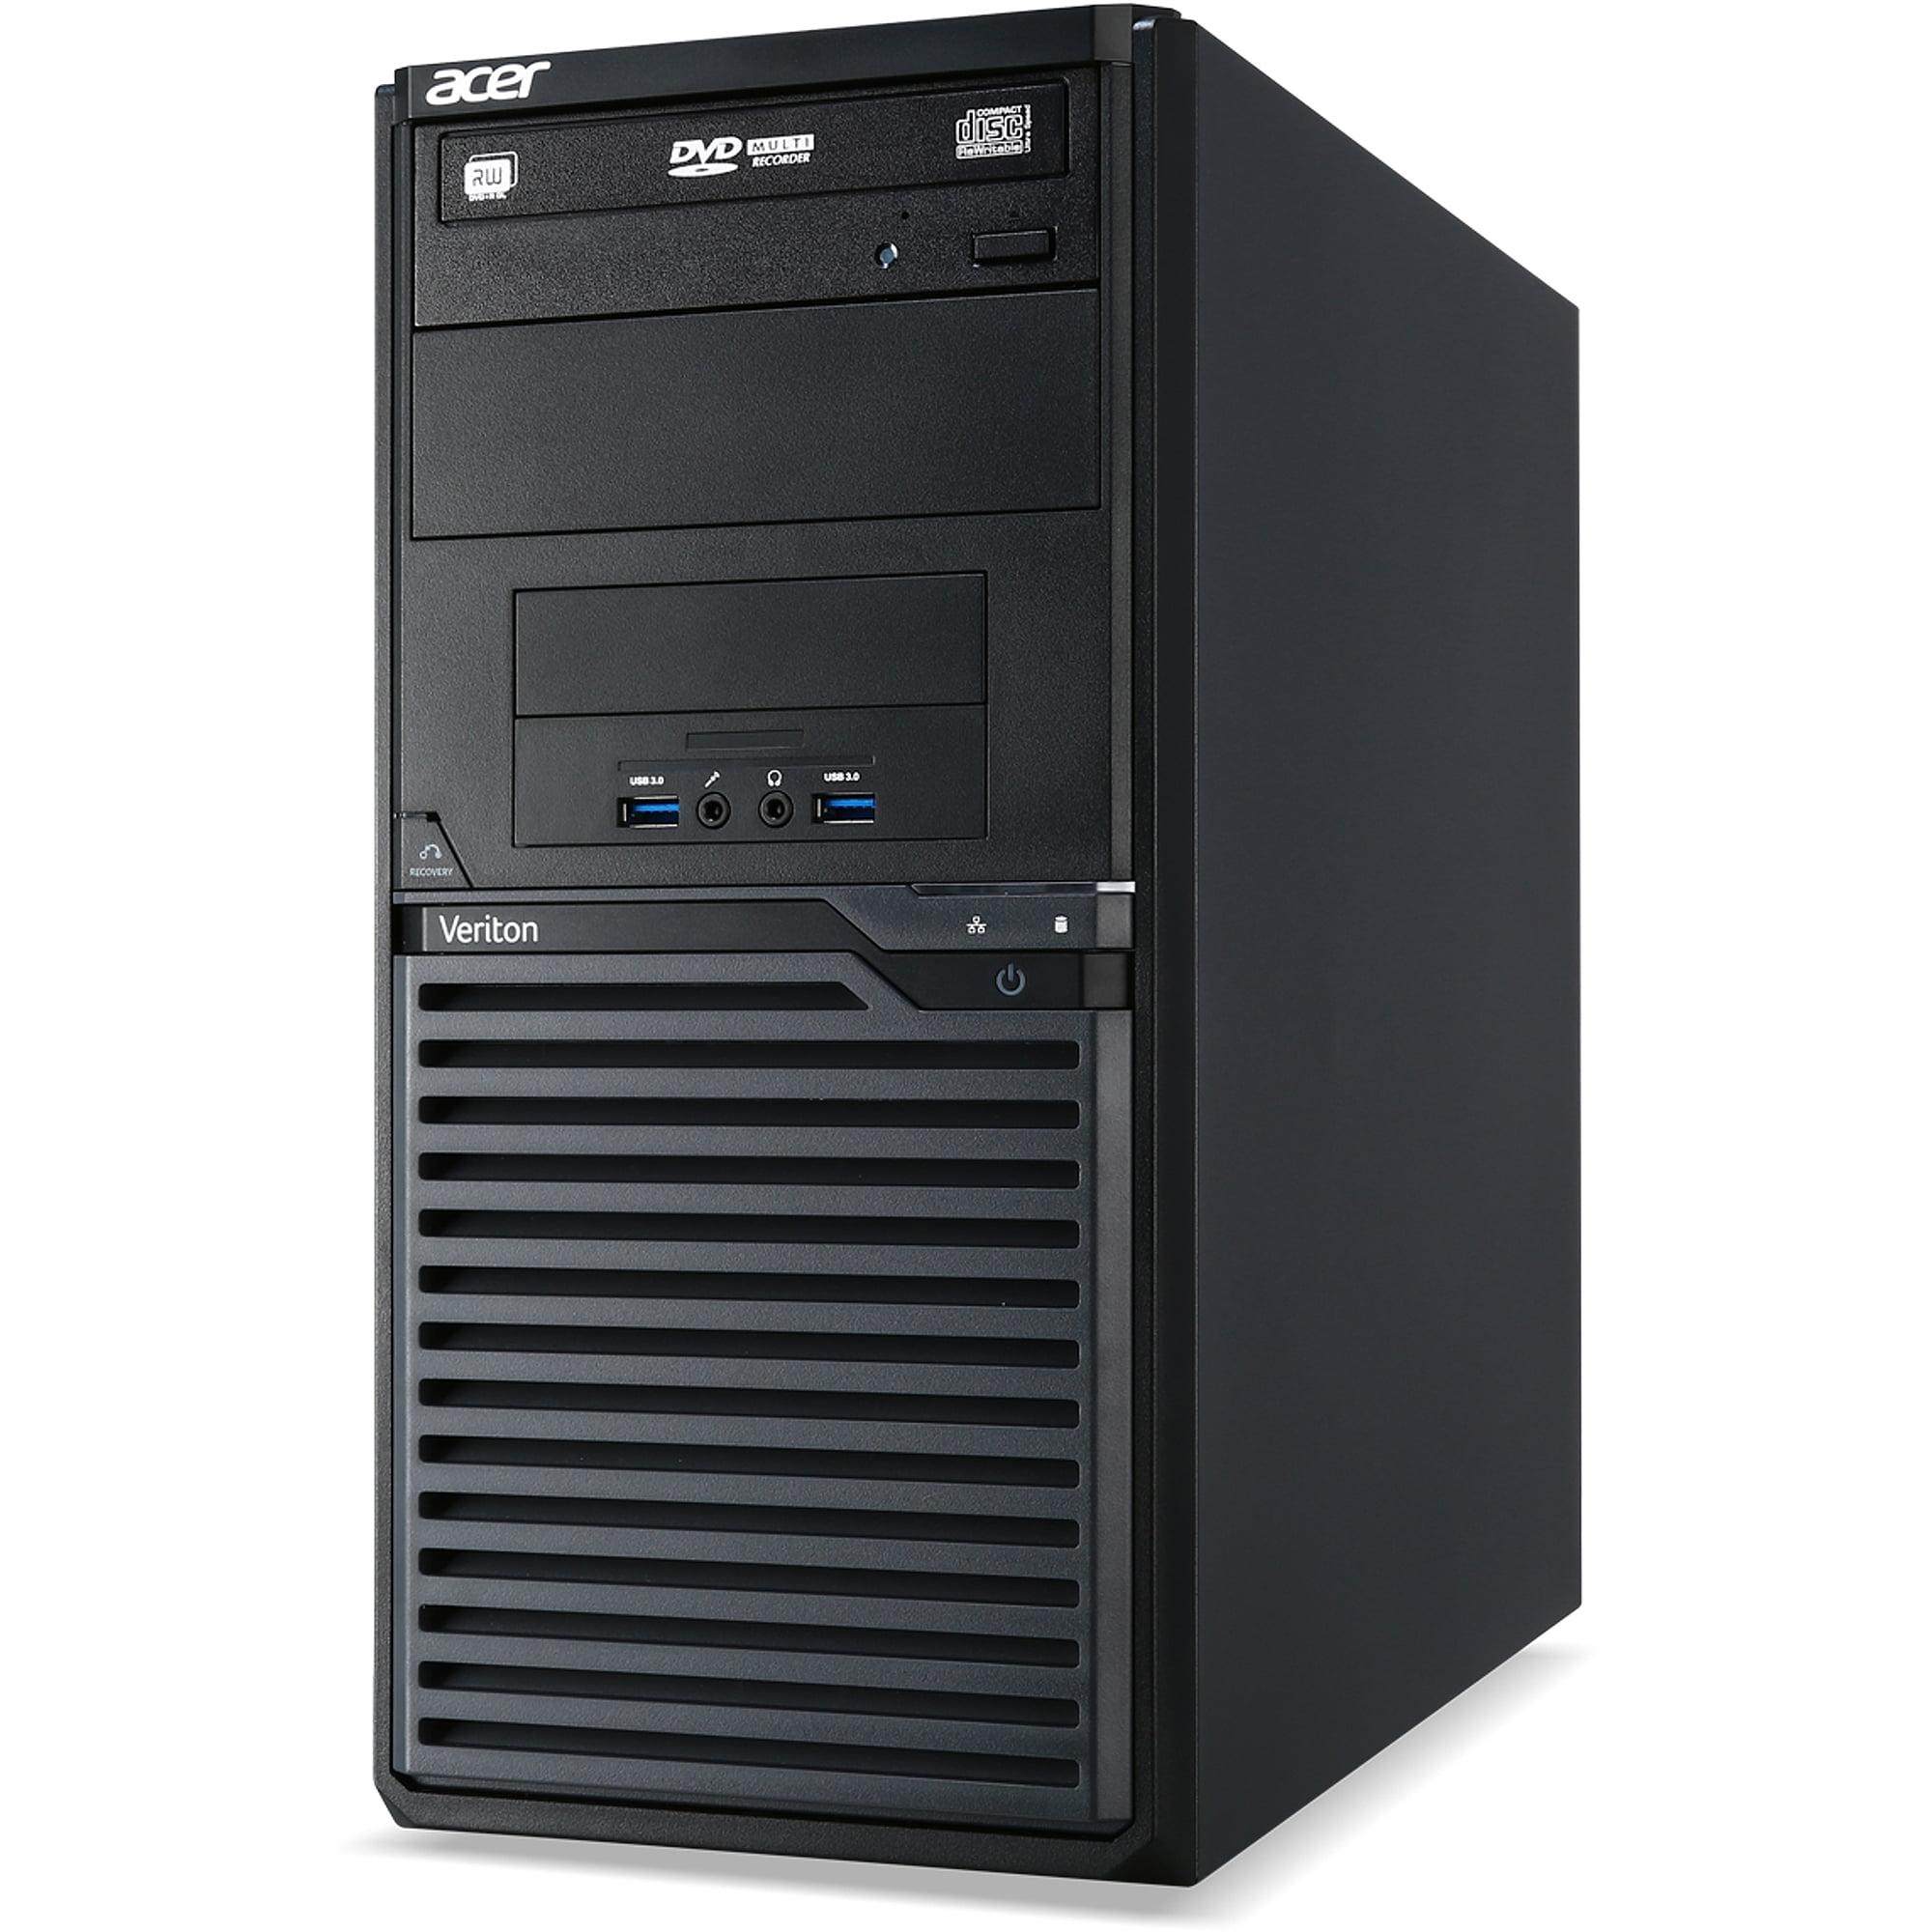 Acer Black Veriton 2 VM2631-i54440X Desktop PC with Intel Core i5-4440 Quad-Core Processor, 4GB Memory, 500GB Hard Drive and Windows 7 Professional (Monitor Not Included)